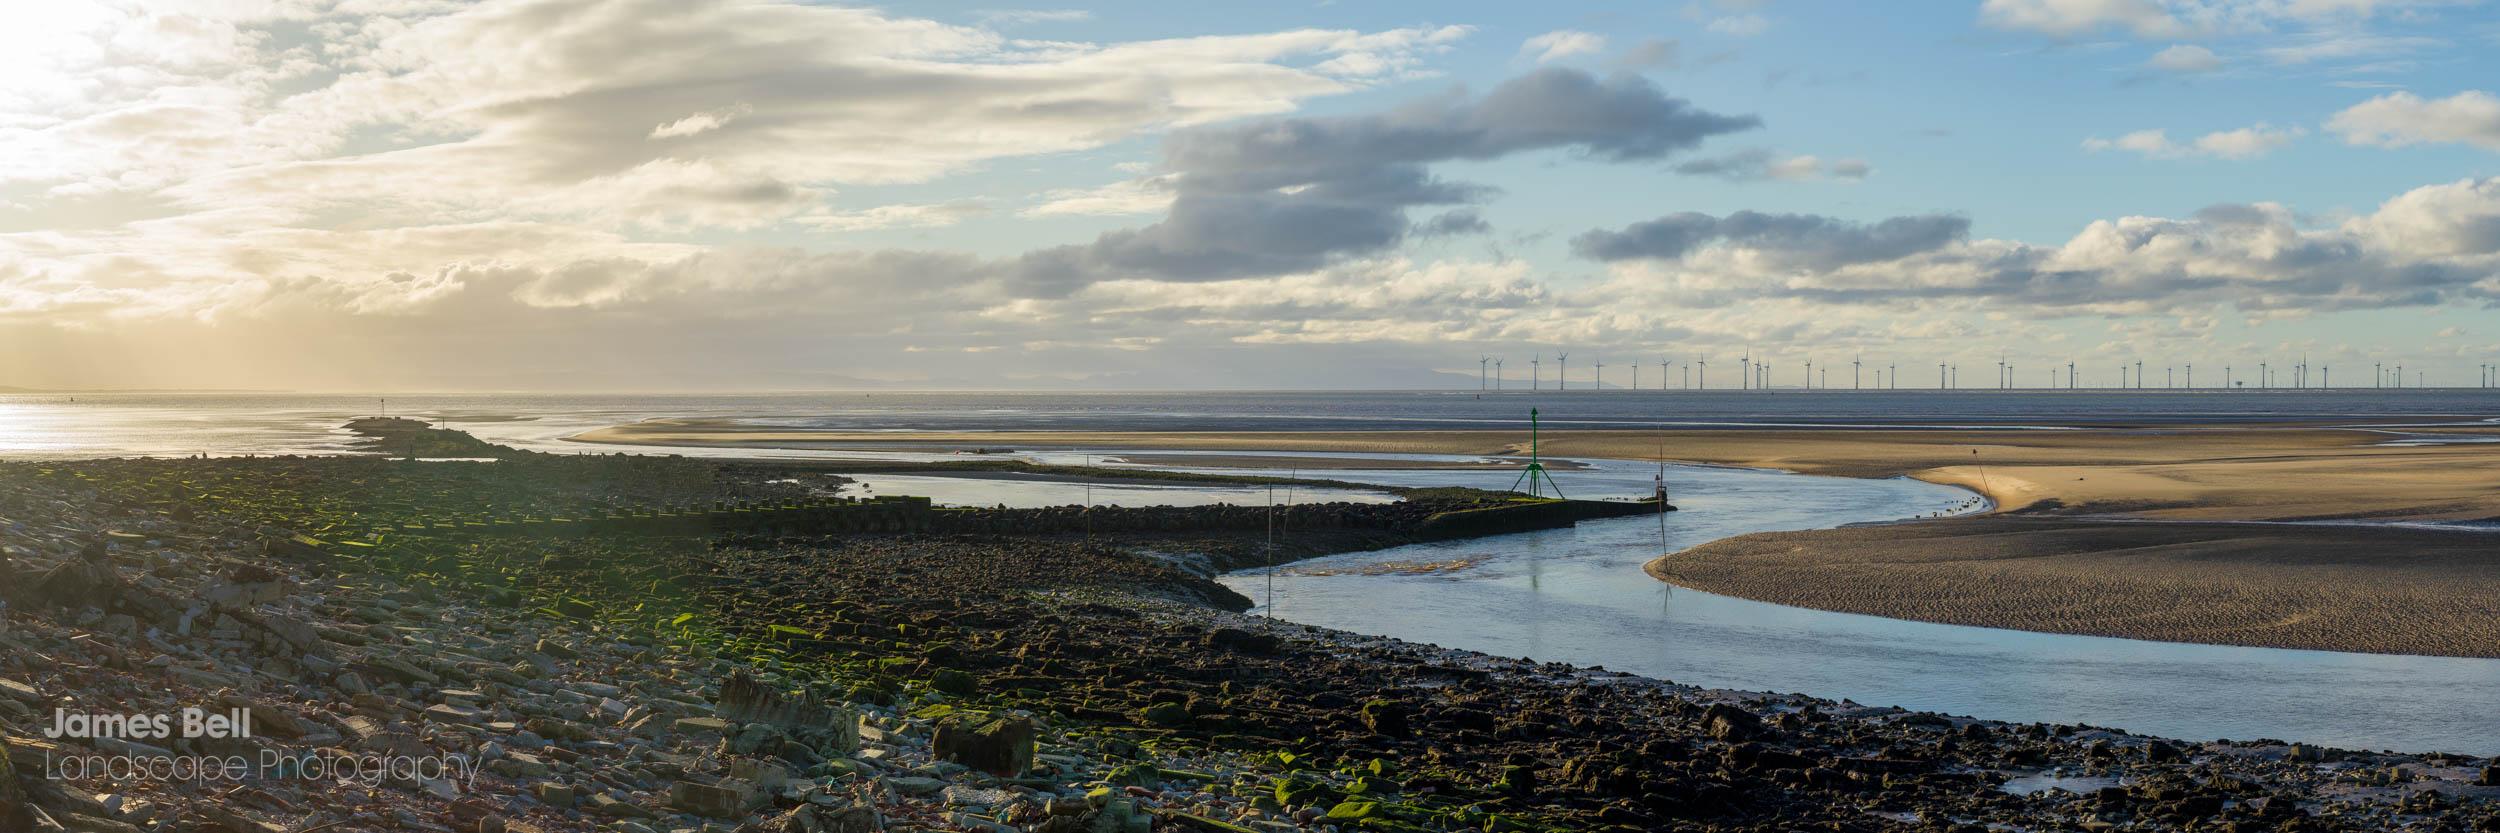 The River Alt meets the Irish Sea